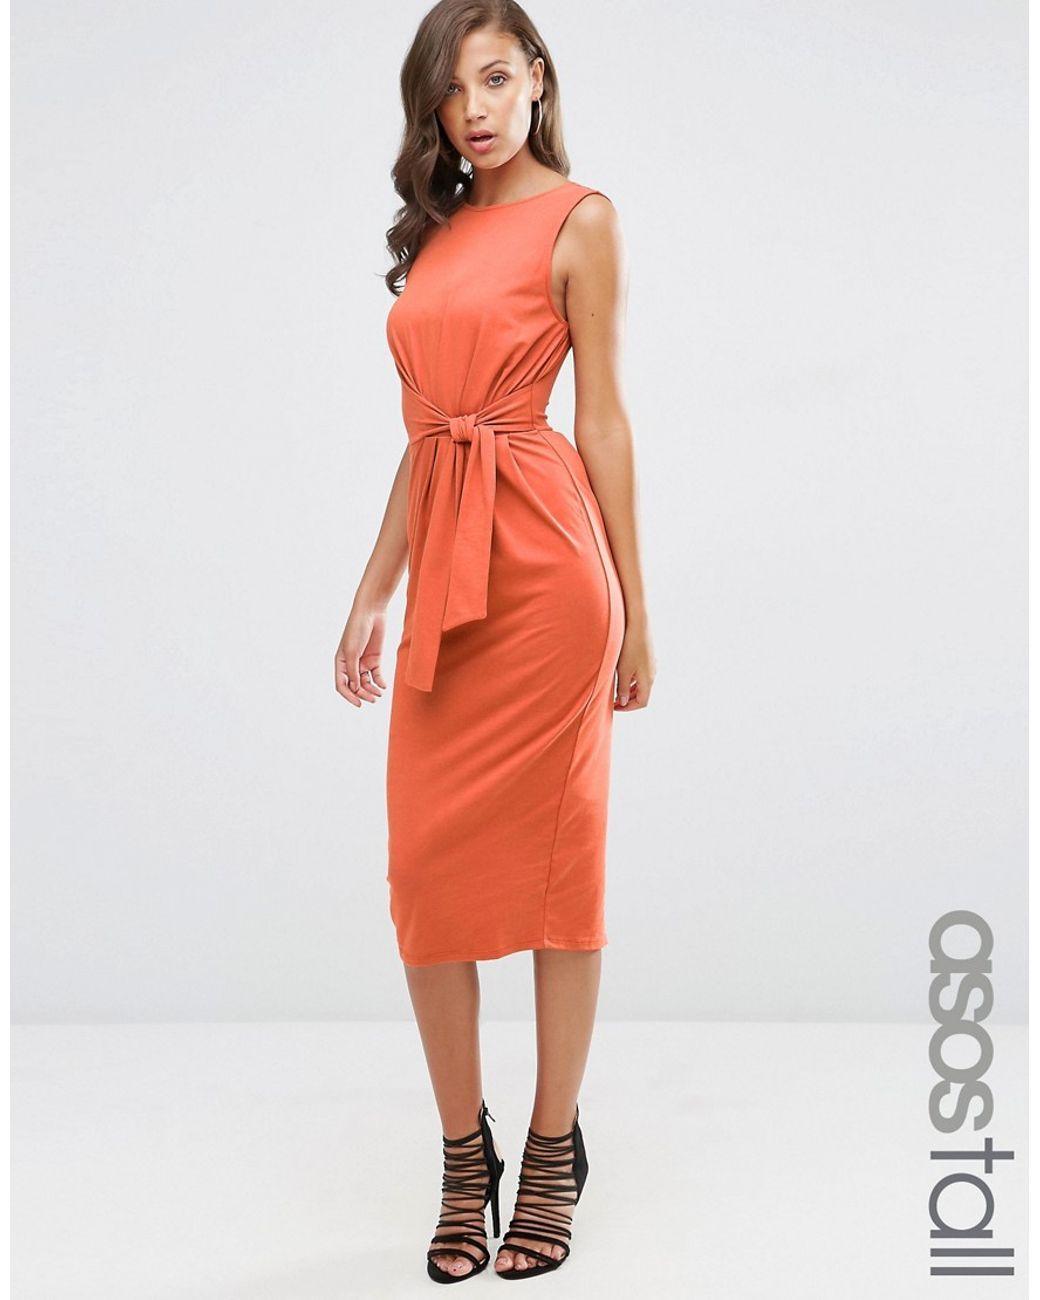 097ffd6b292 Women s Orange Tie Side Midi Bodycon Dress